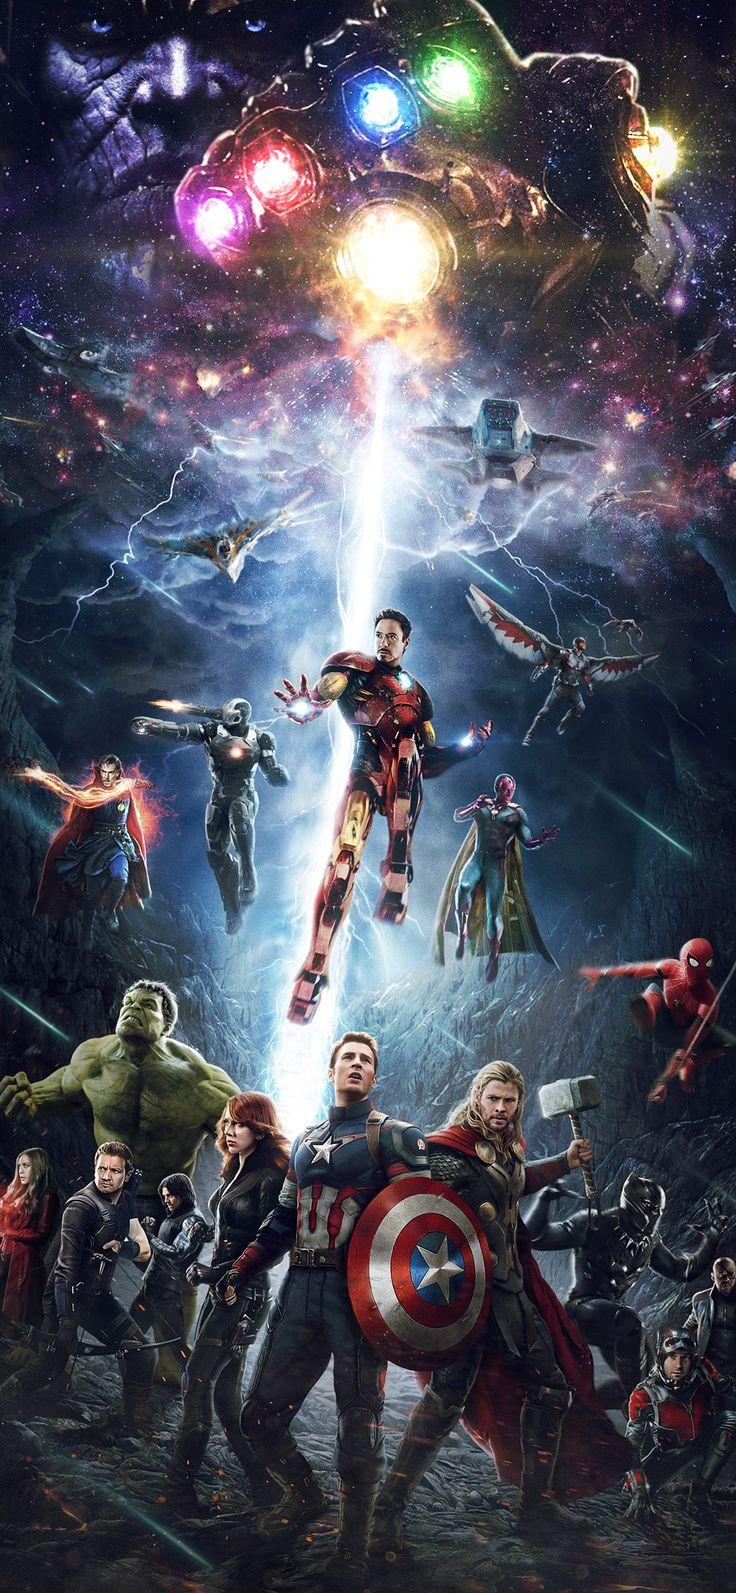 be83-marvel-infinitywar-avengers-hero-art via iPhoneXpapers.com - Wallpapers for...